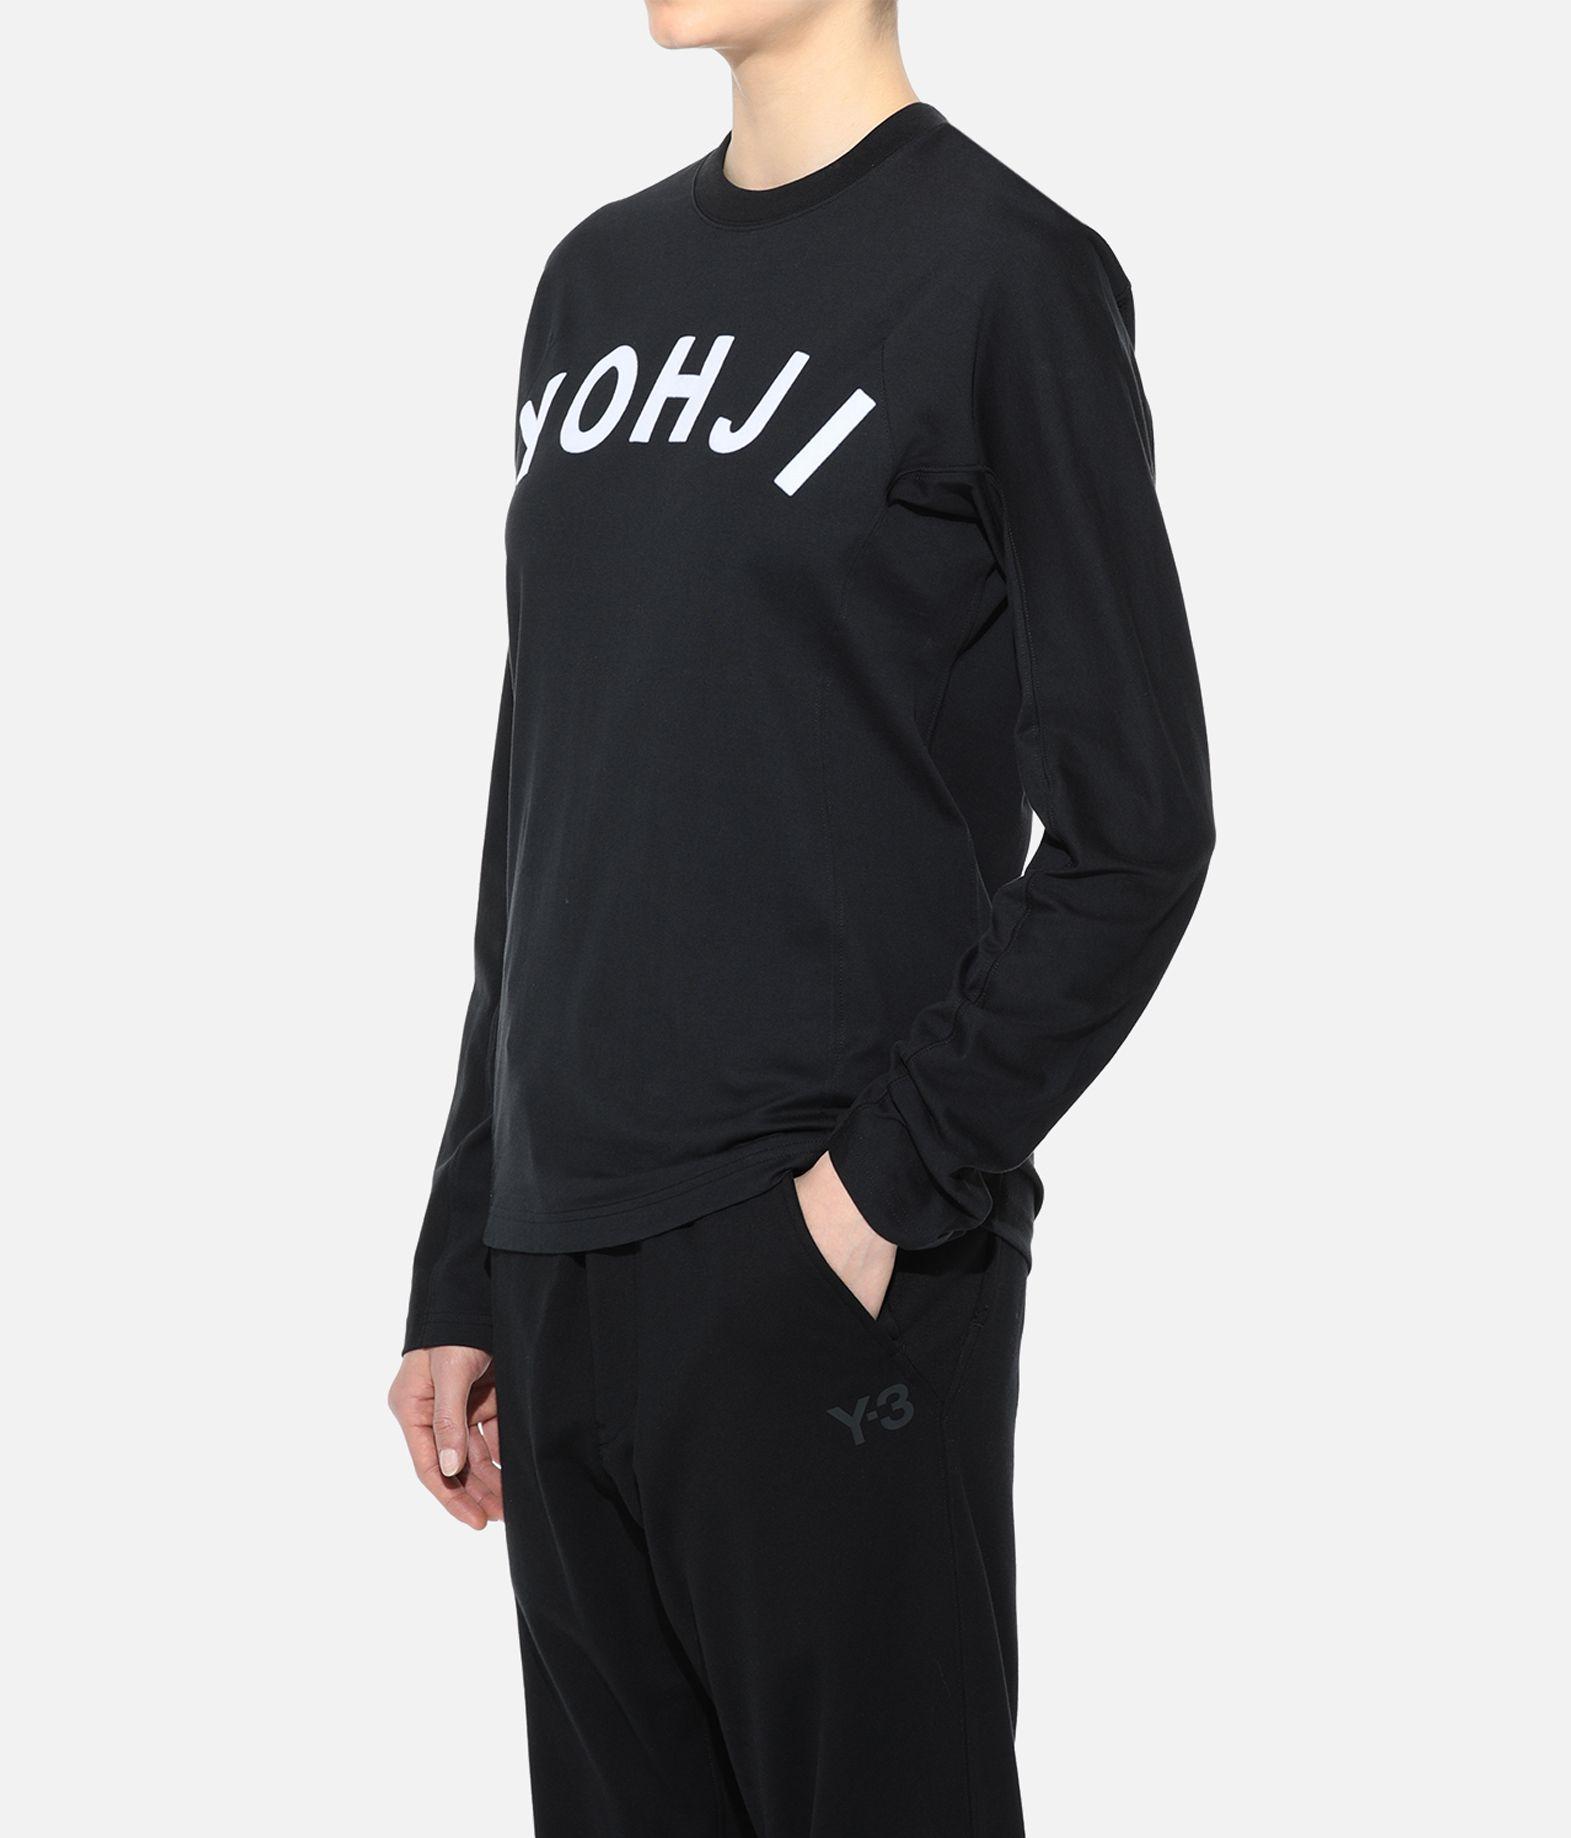 Y-3 Y-3 Yohji Letters Tee T-shirt maniche lunghe Donna e